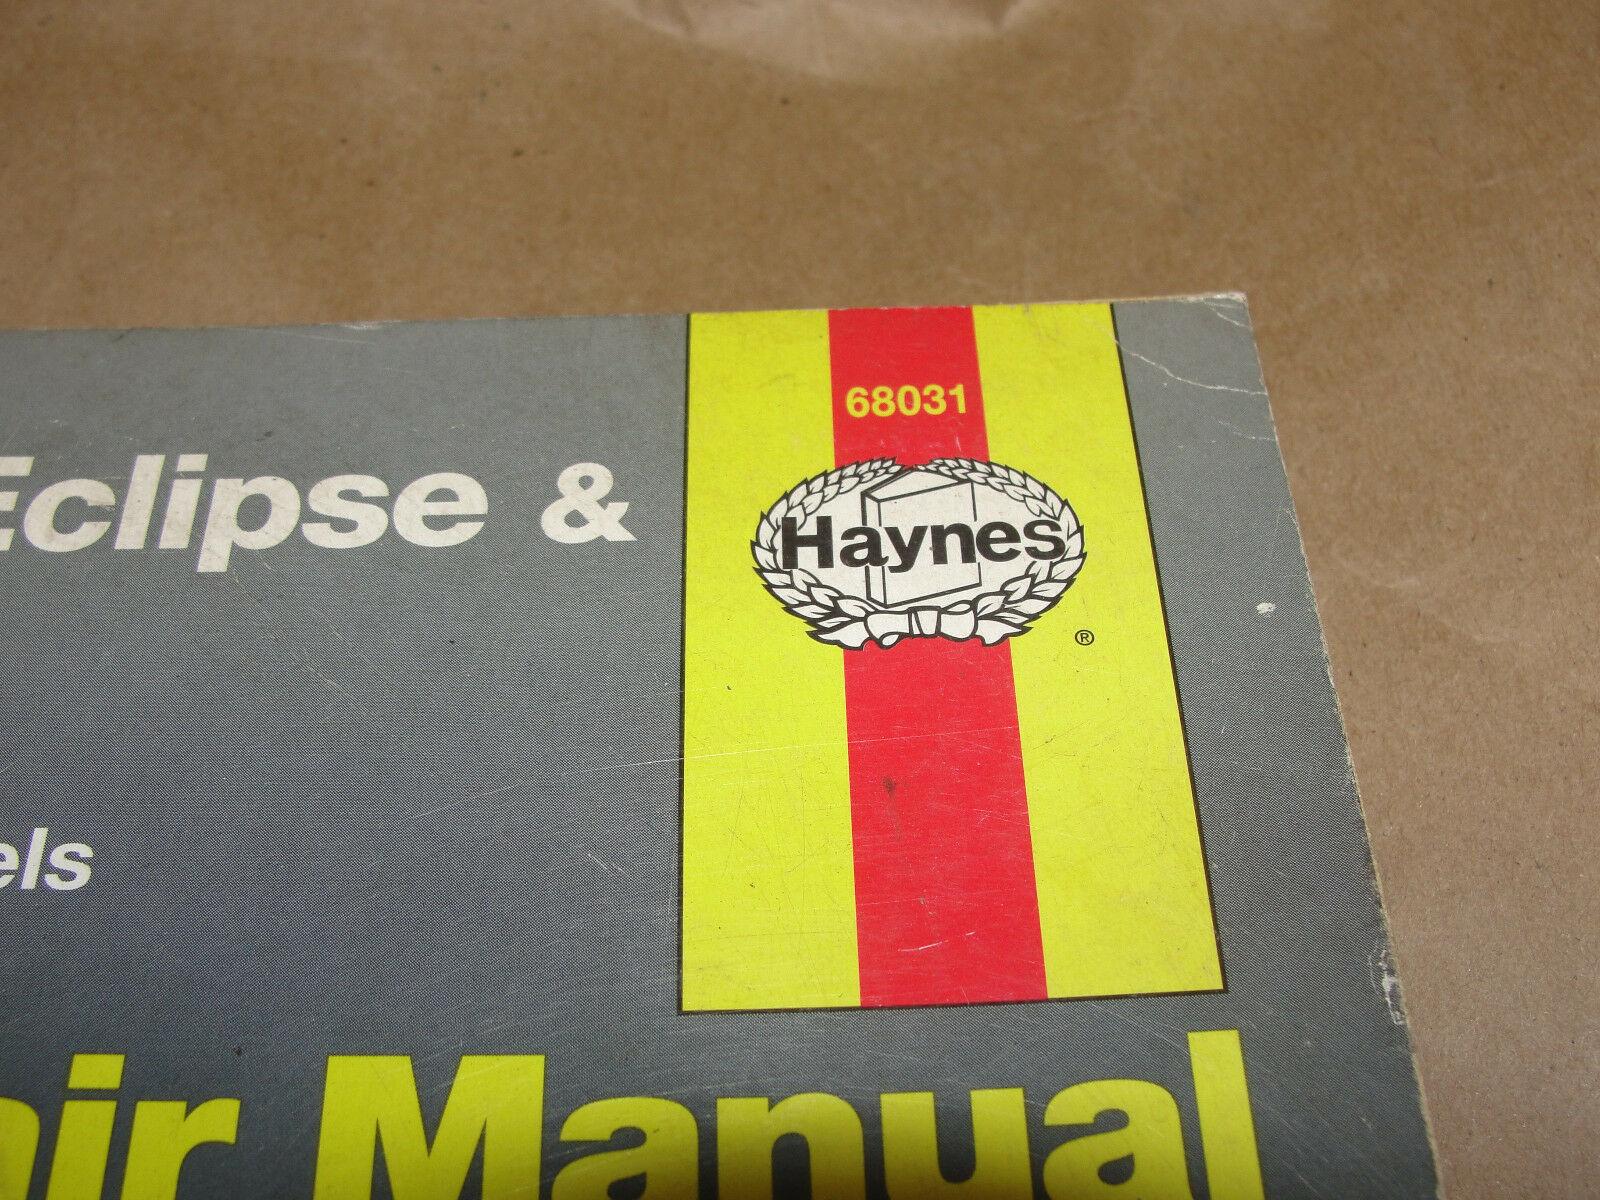 HAYNES 1995-2001 MITSUBISHI ECLIPSE & EAGLE TALON REPAIR MANUAL 68031